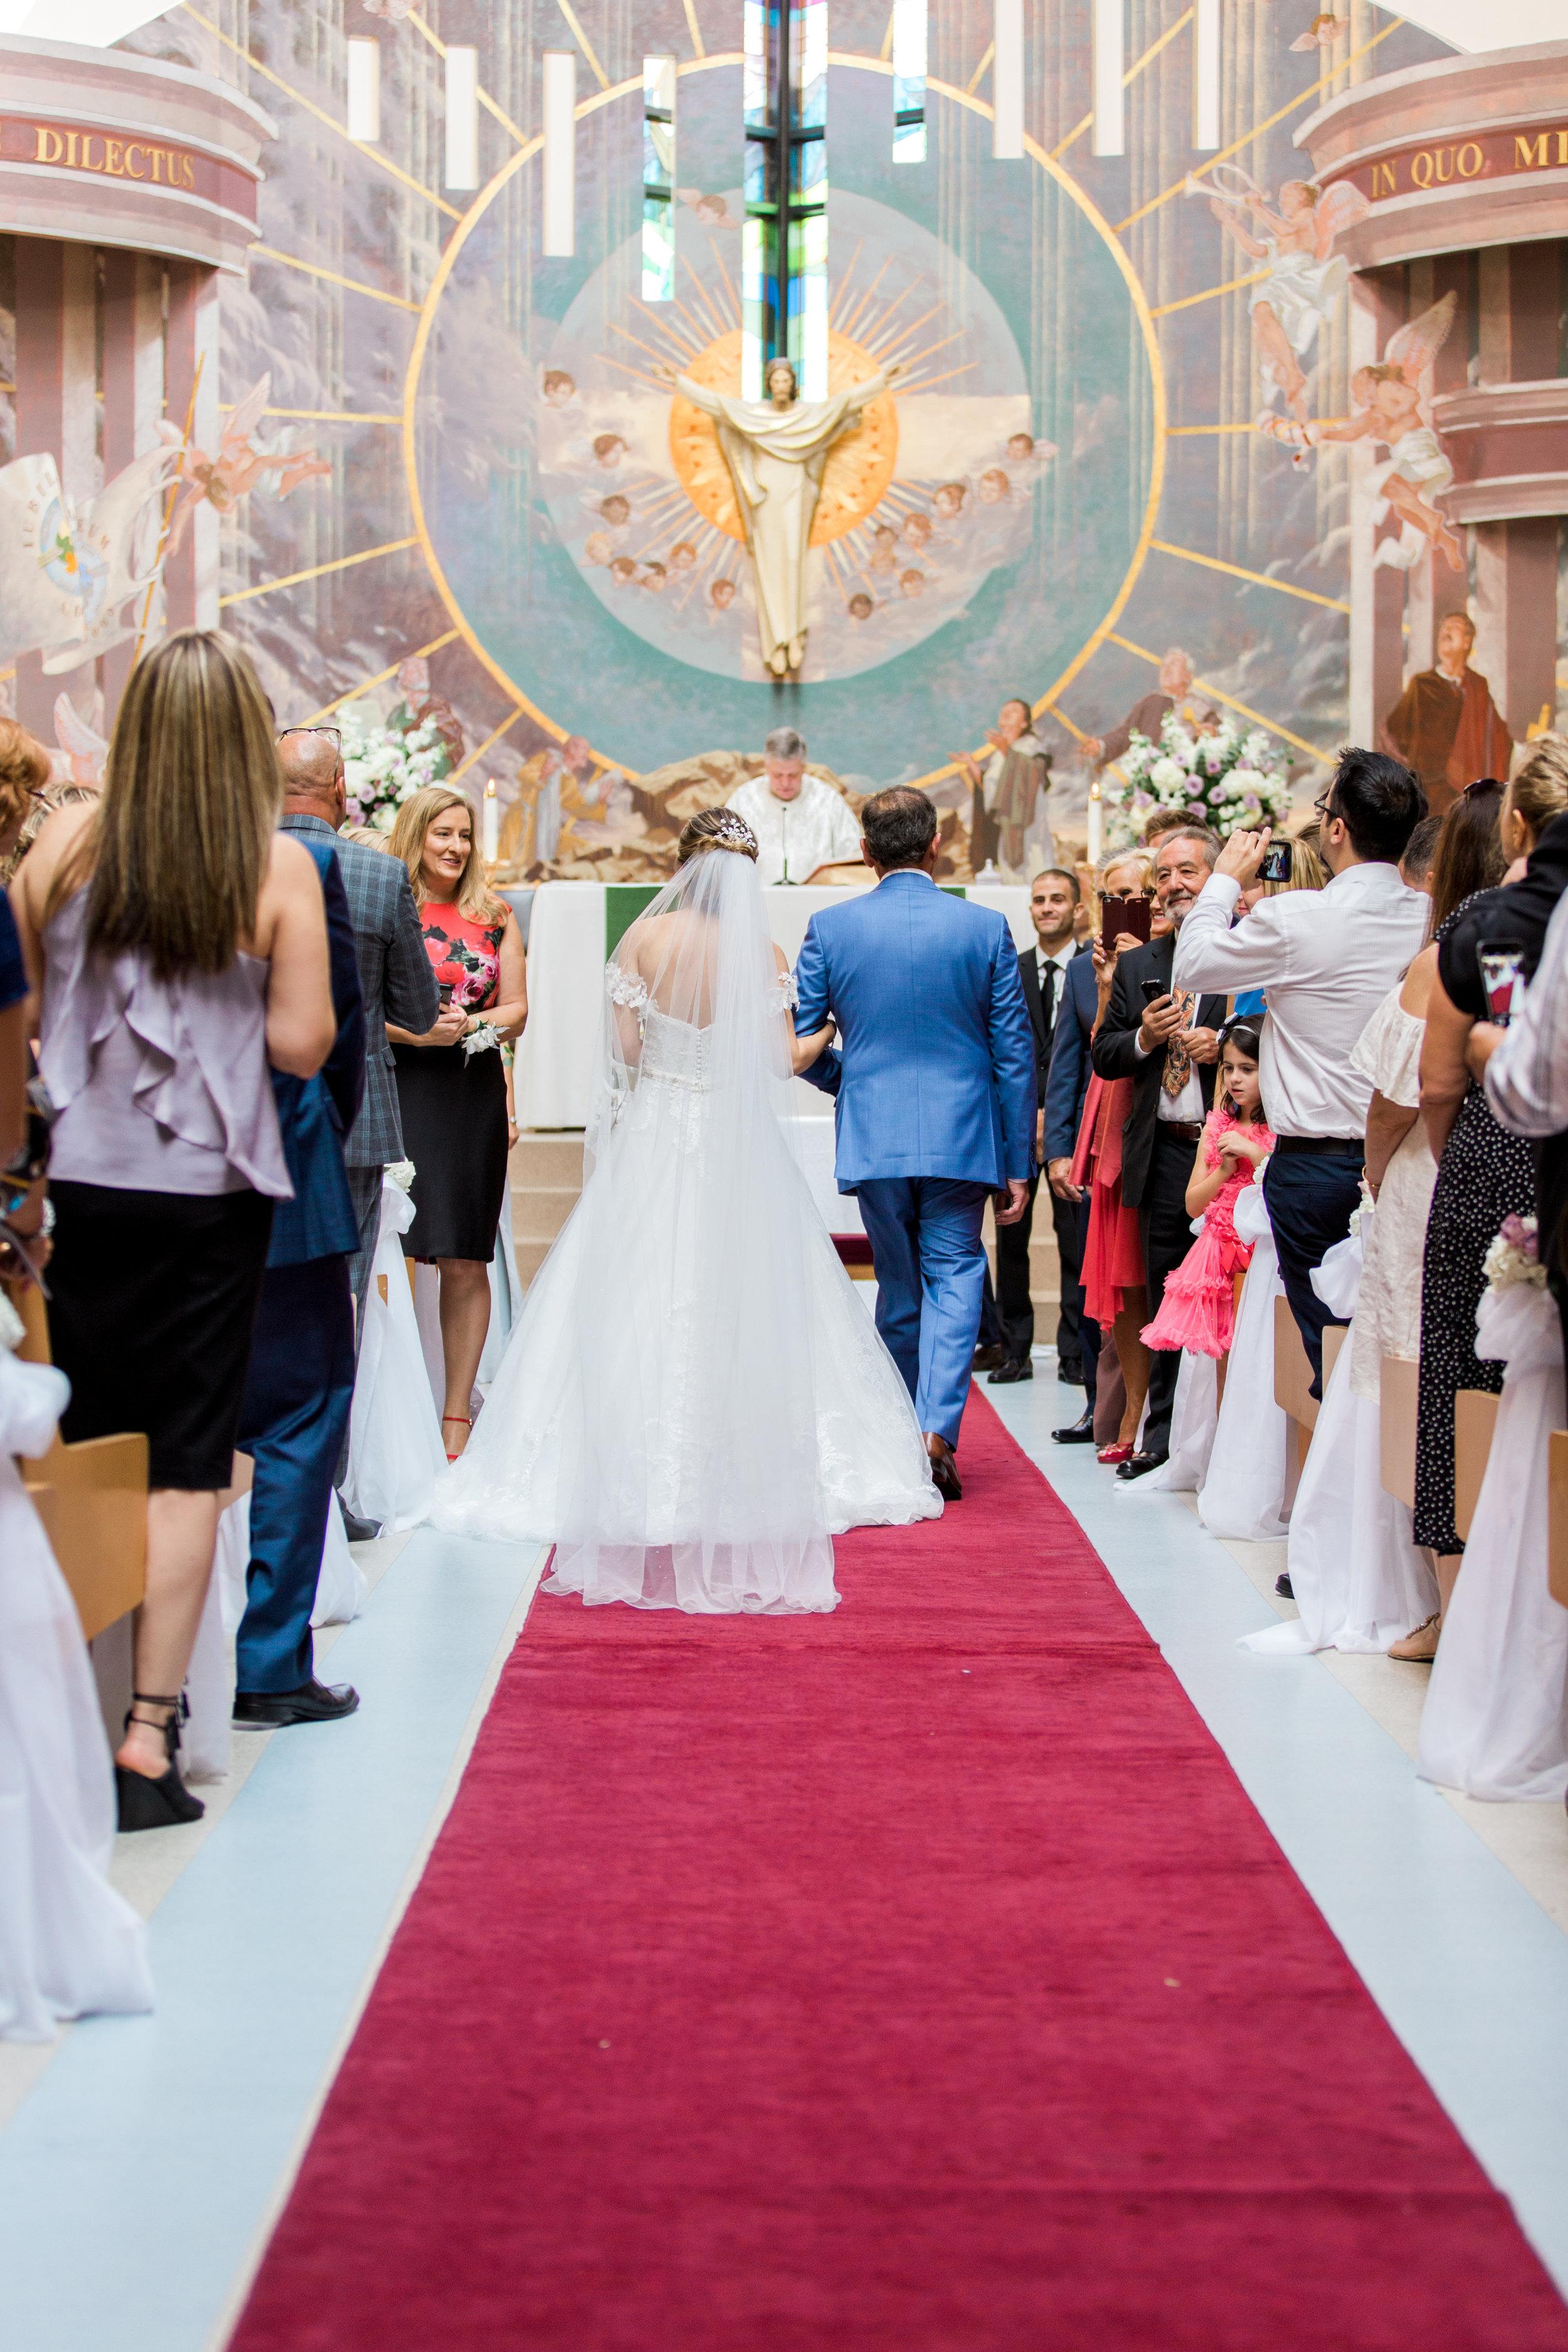 Danielle-Giroux-Amir-Golbazi-Toronto-Wedding-Photographer-Bellvue-Manor_DeLuca_1-335.jpg